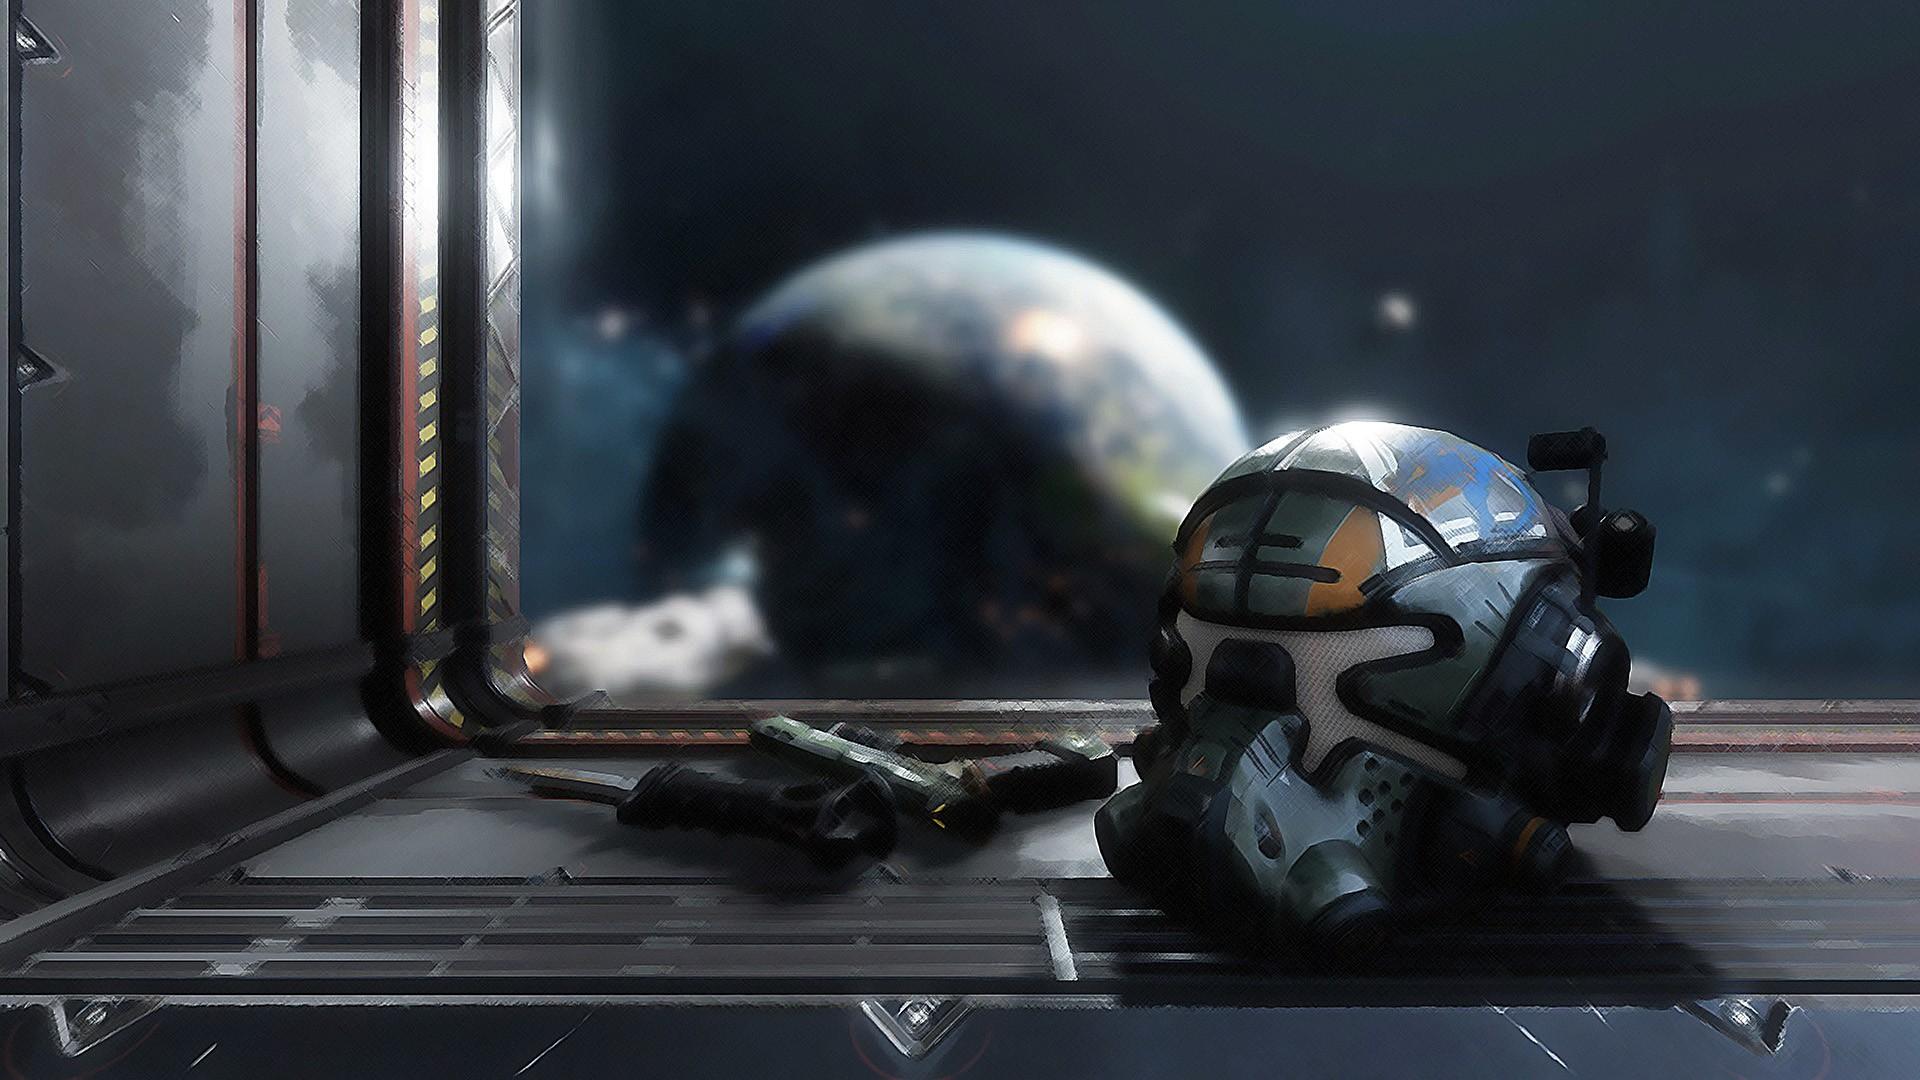 Wallpaper Helmet of solider of Titanfall 2 video game